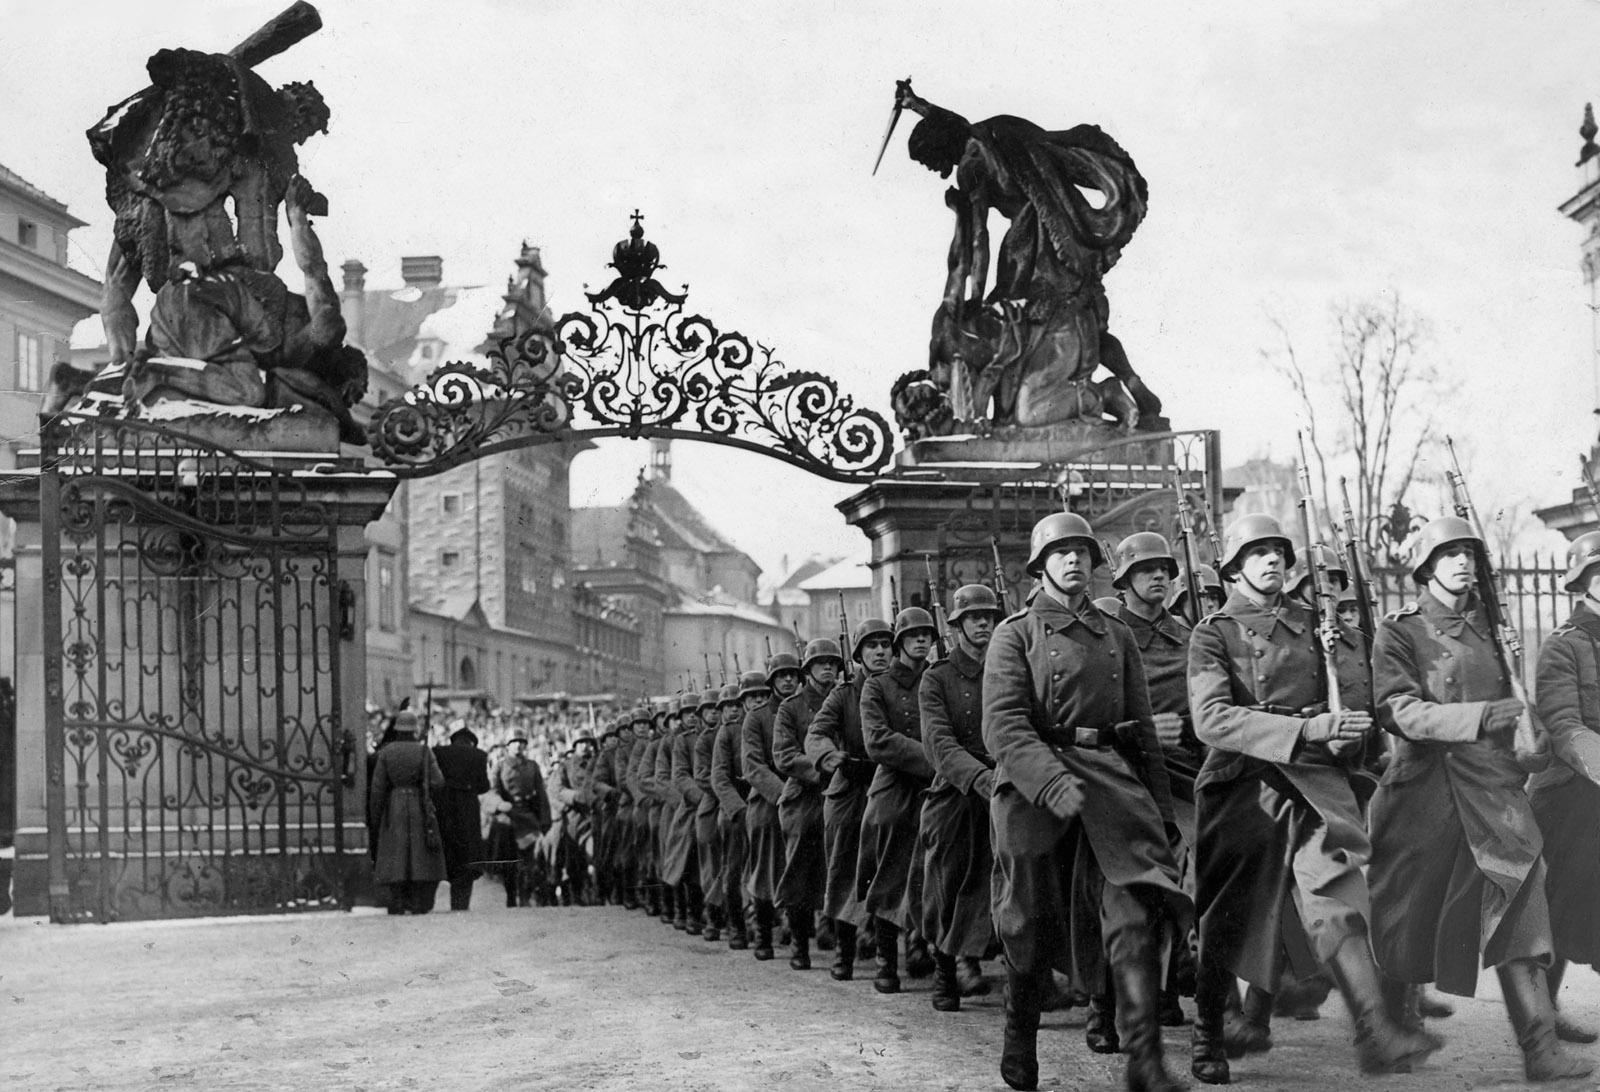 German troops entering the grounds of Hradčany Castle, Prague, March 1939